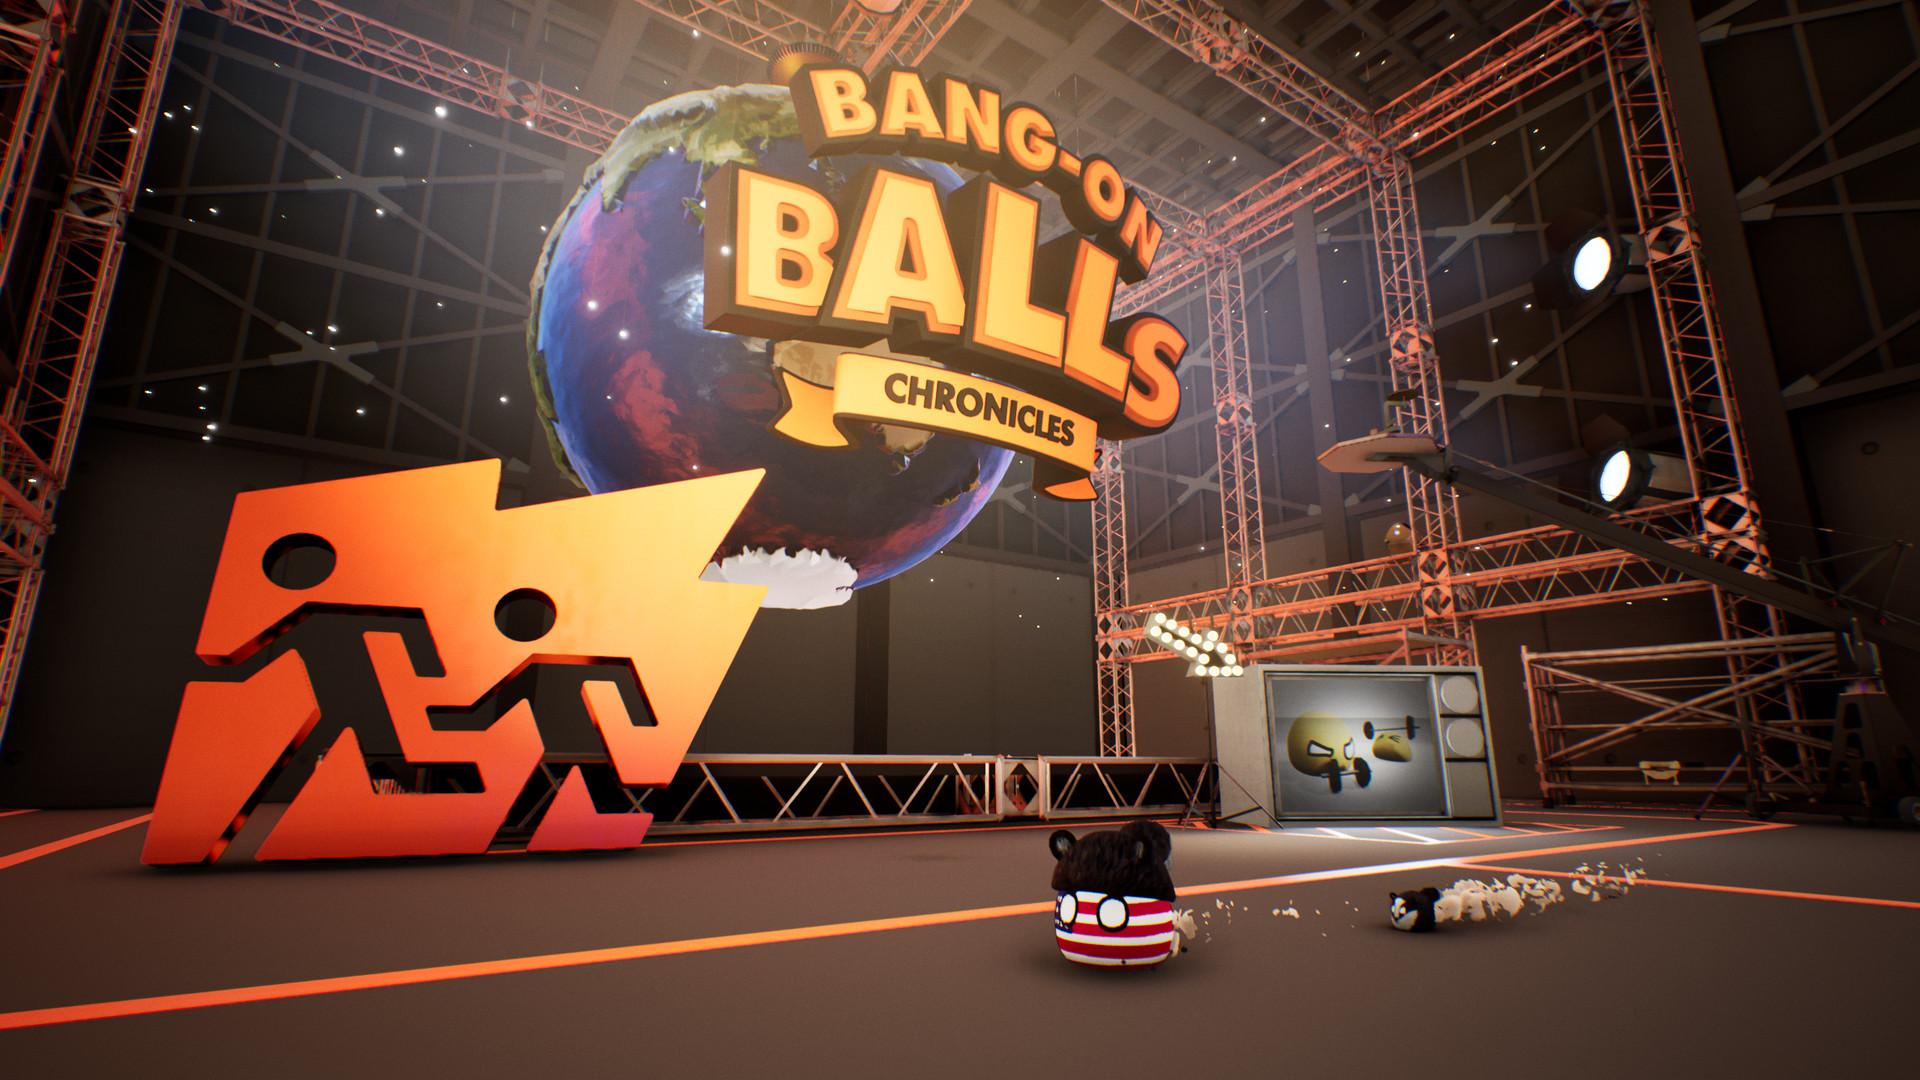 Bang-On Balls: Chronicles Cracked